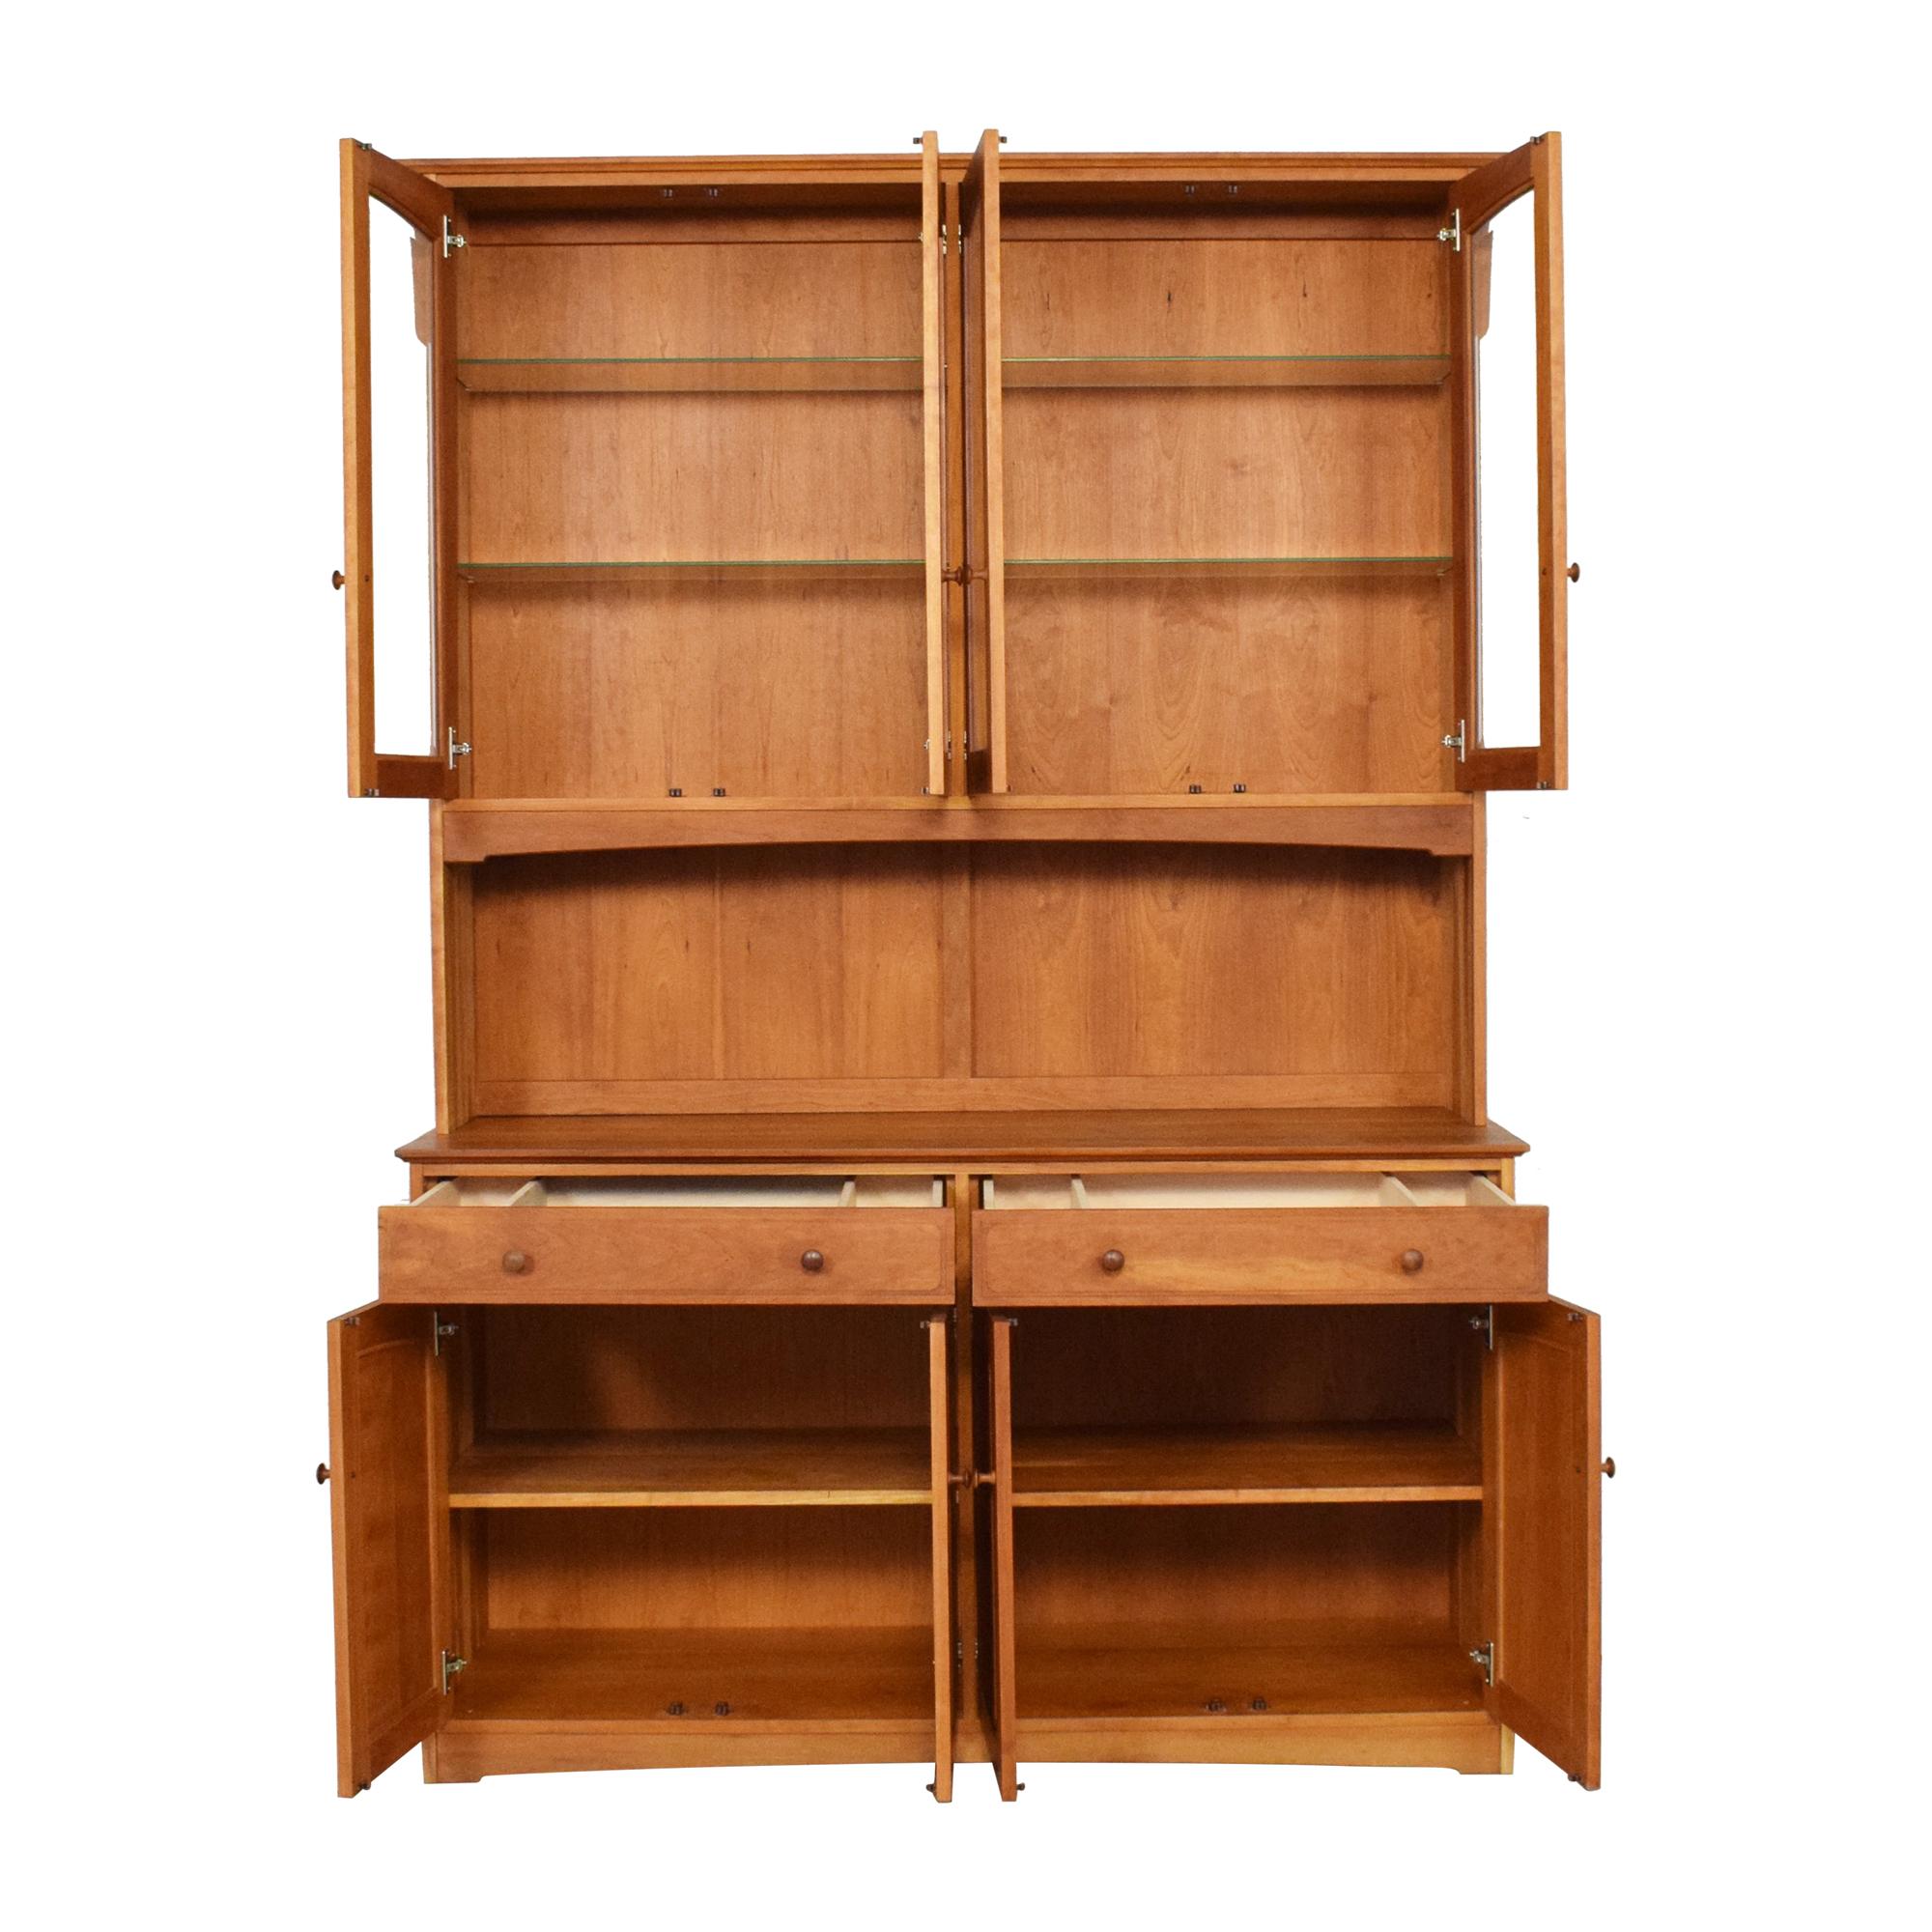 Scott Jordan Furniture Scott Jordan Buffet with Hutch Cabinets & Sideboards